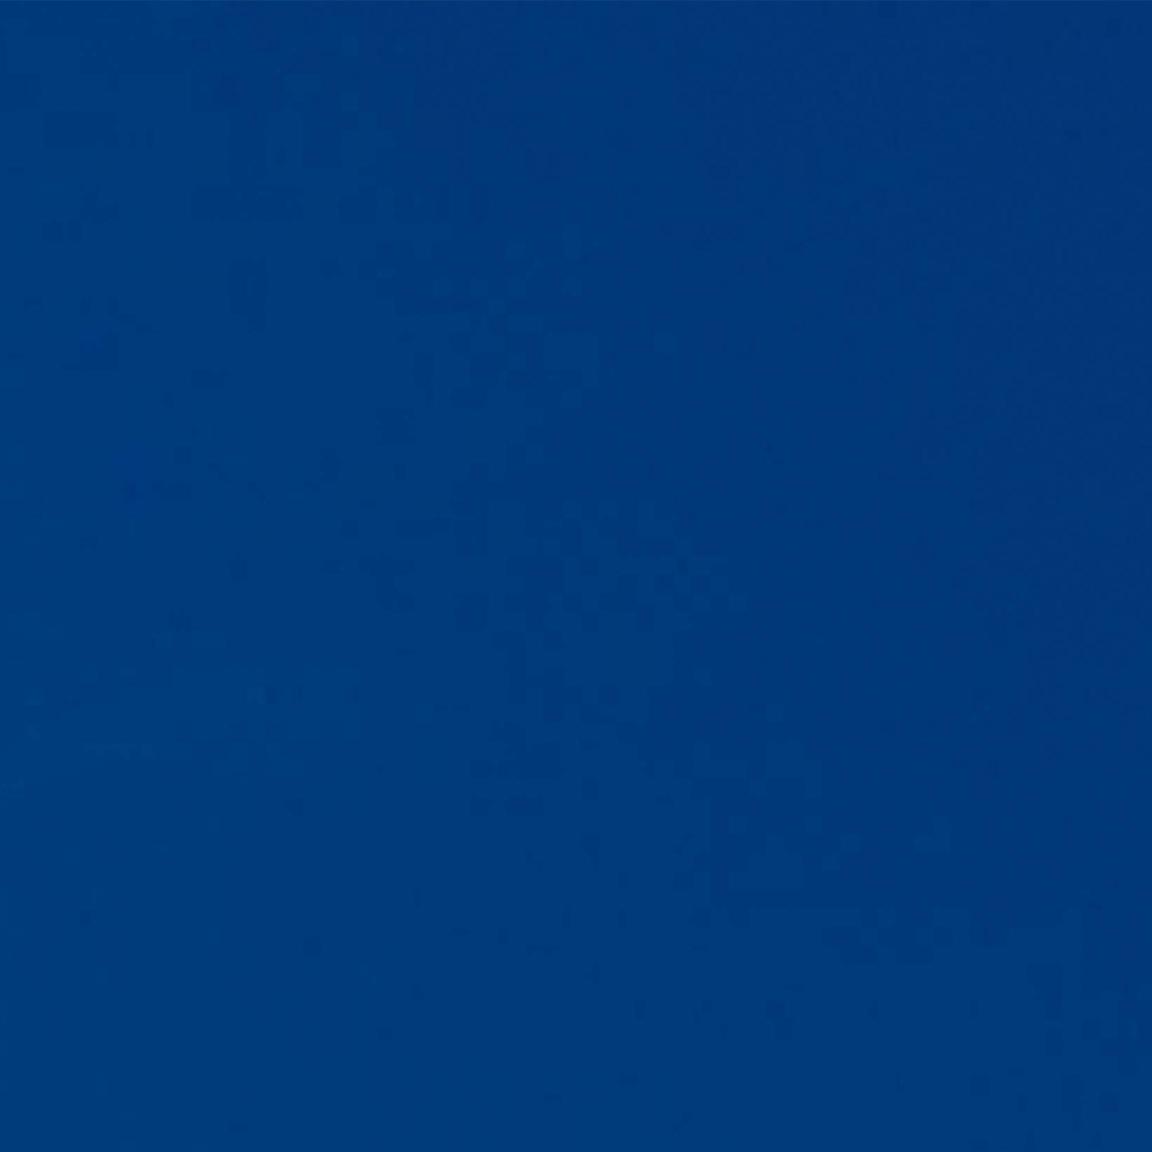 Blue Ceramic Steel - Plain Surface